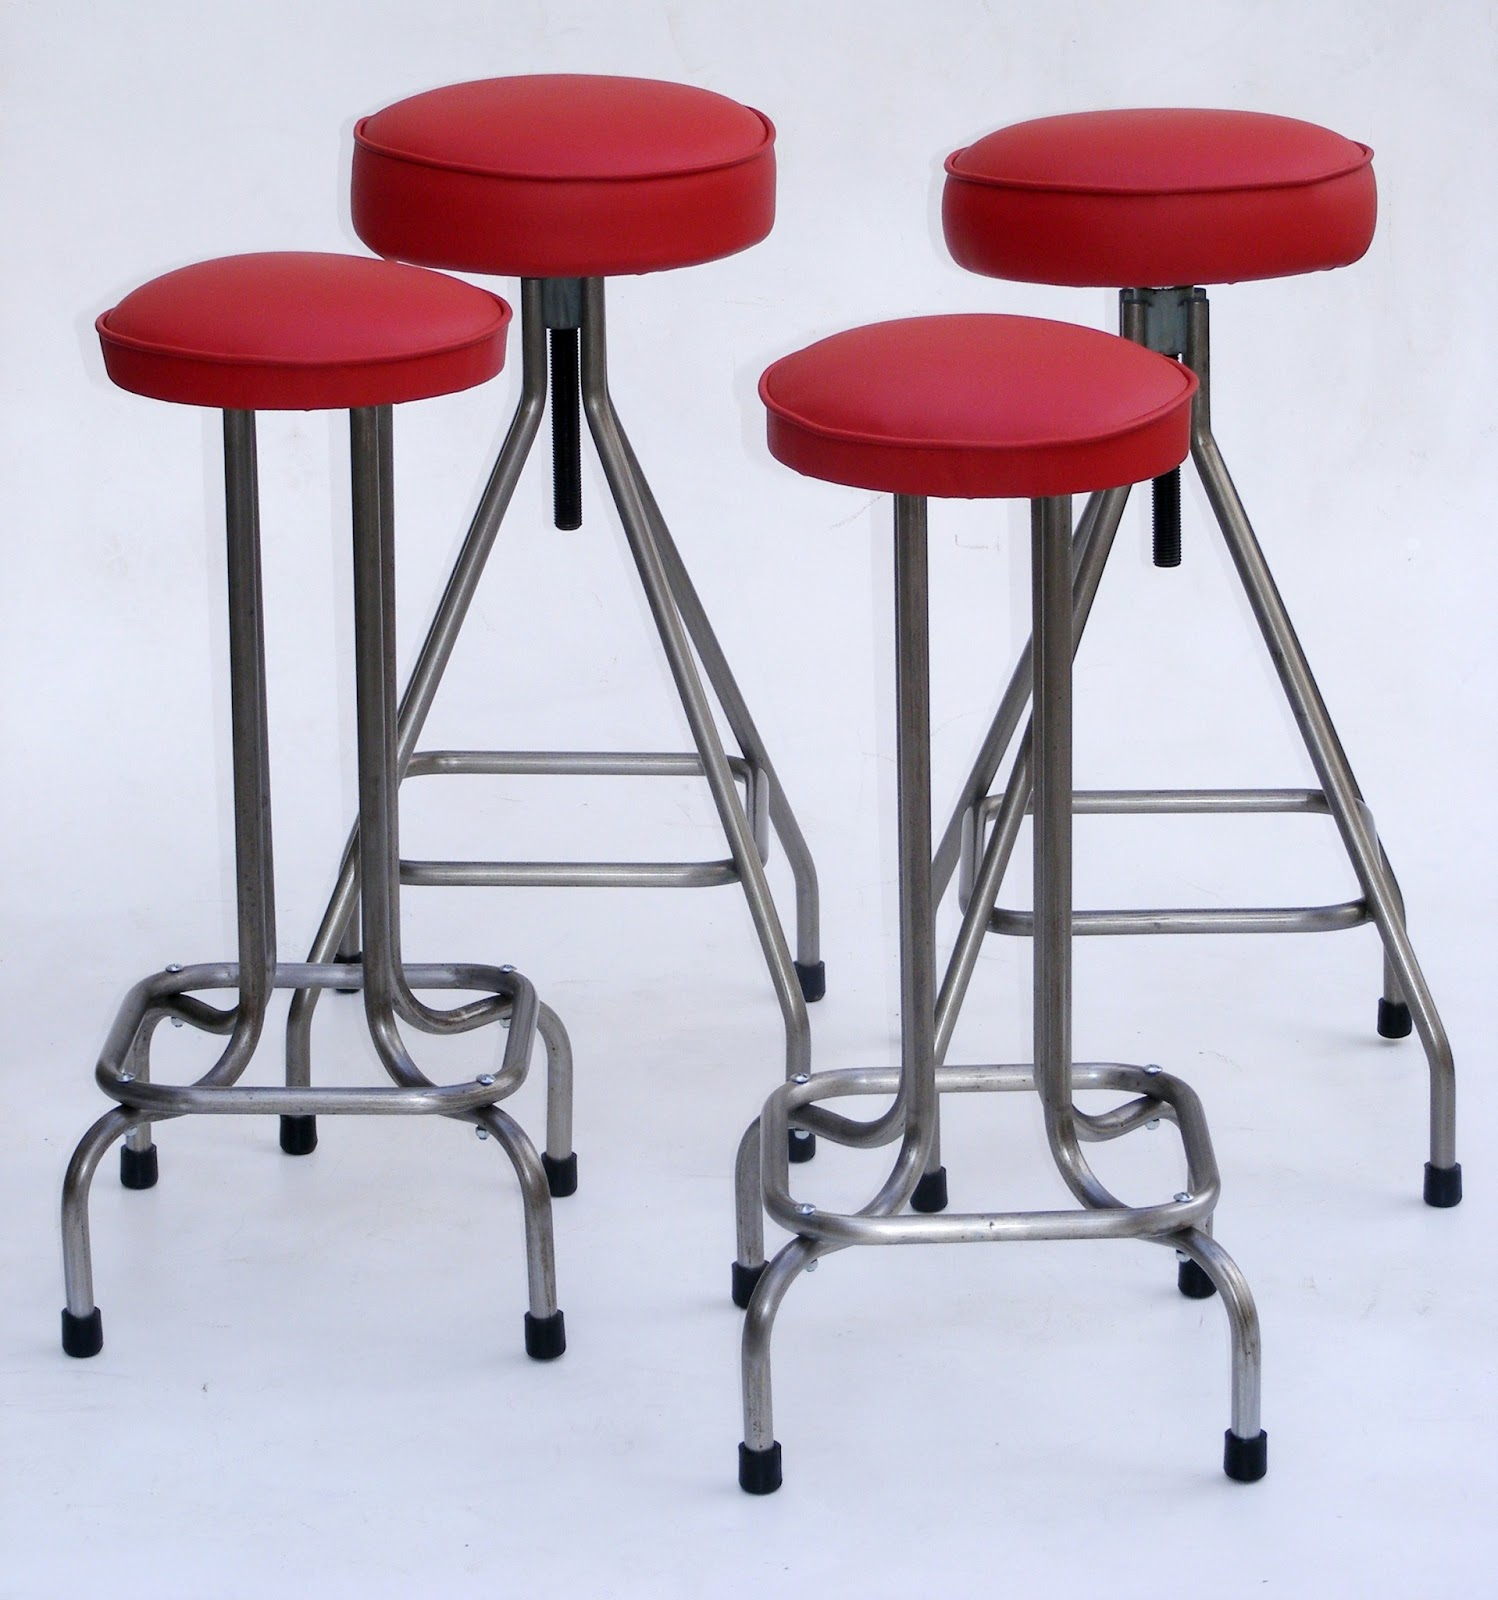 VAMP FURNITURE: This Weeks New Vintage Furniture Stock At